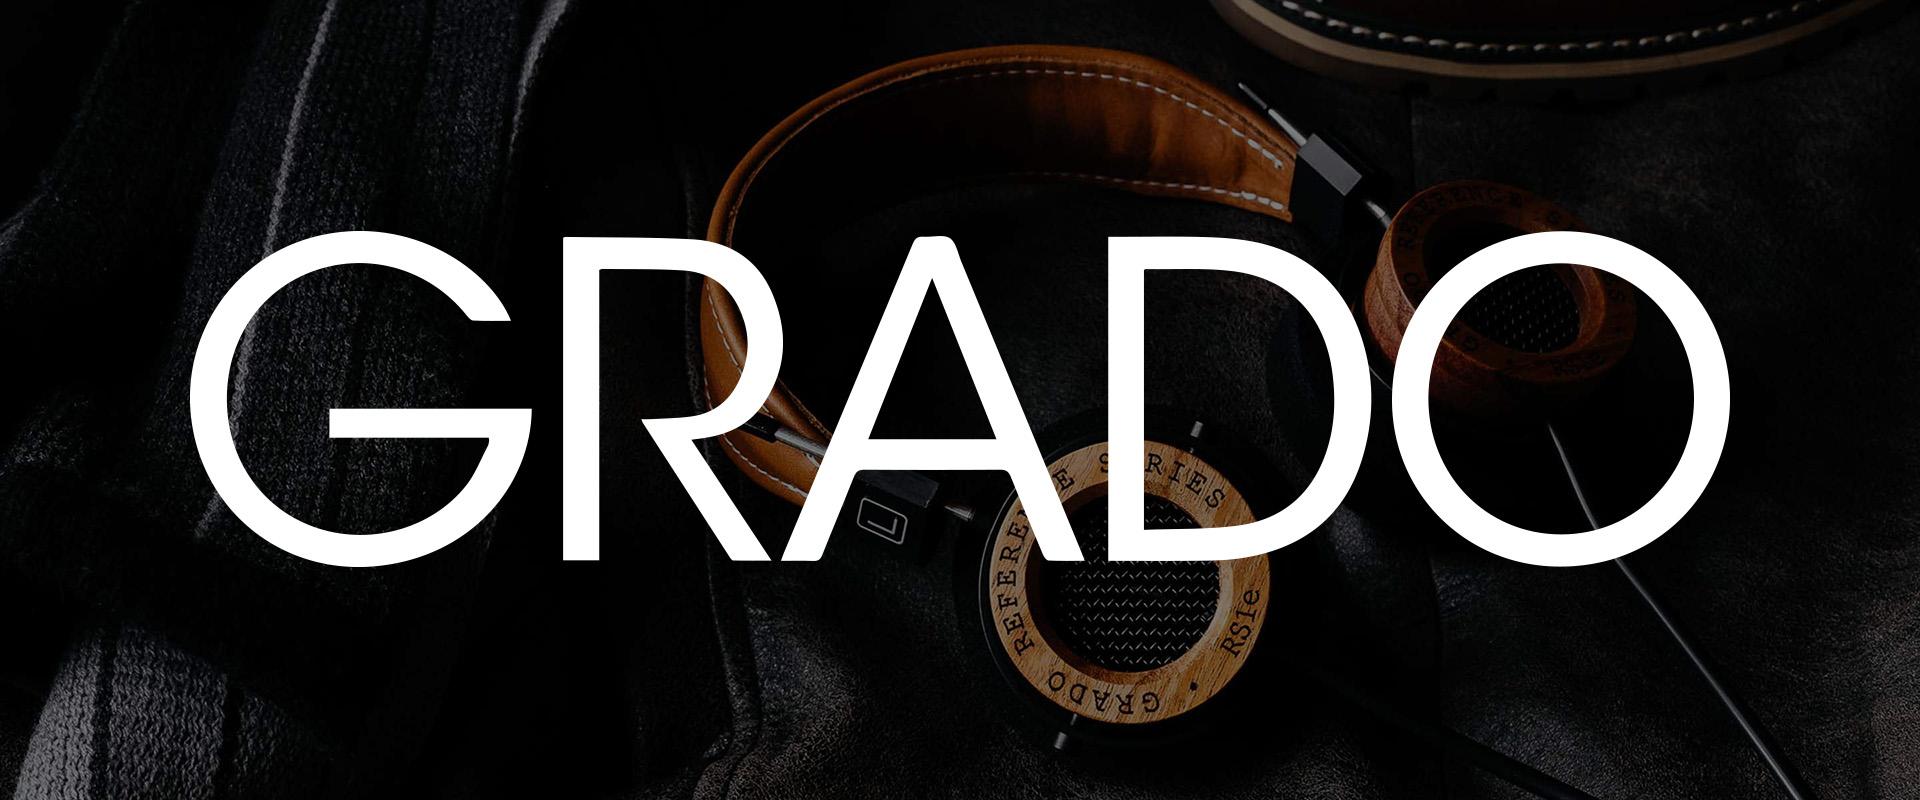 Grado - Chattelin Audio Systems